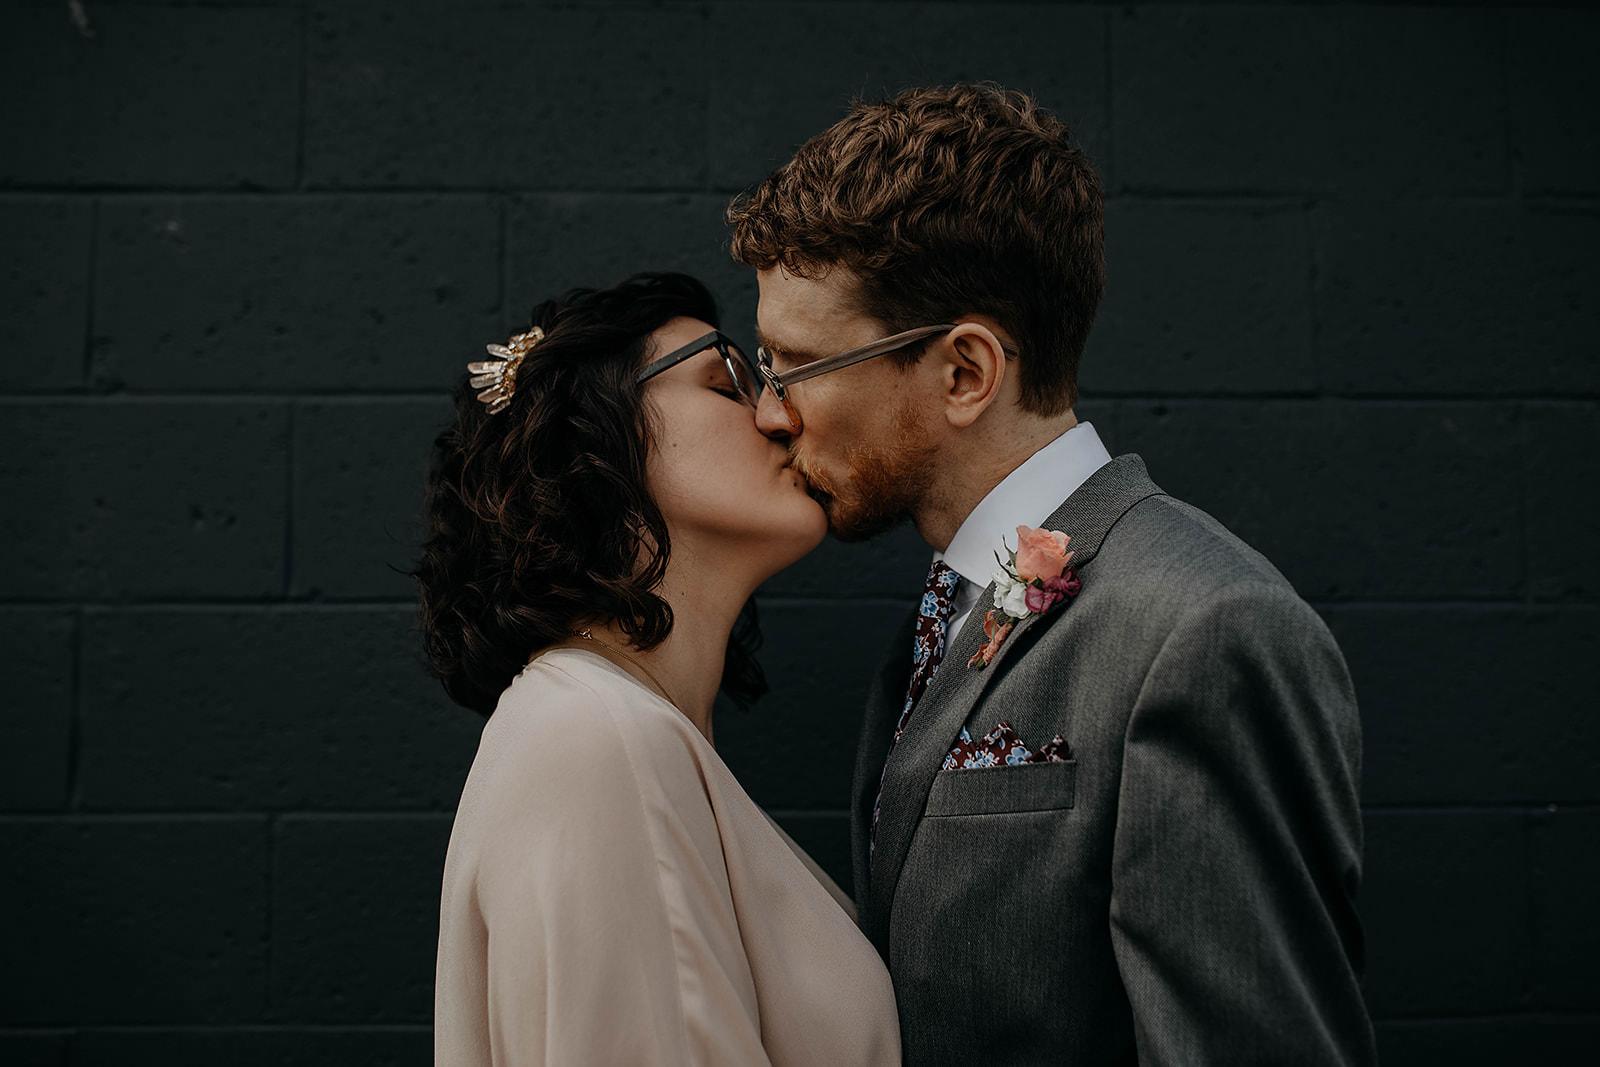 Gahanna Sanctuary Quirky Wedding Isabel and Luke Grace E Jones photography wedding photography142.jpg